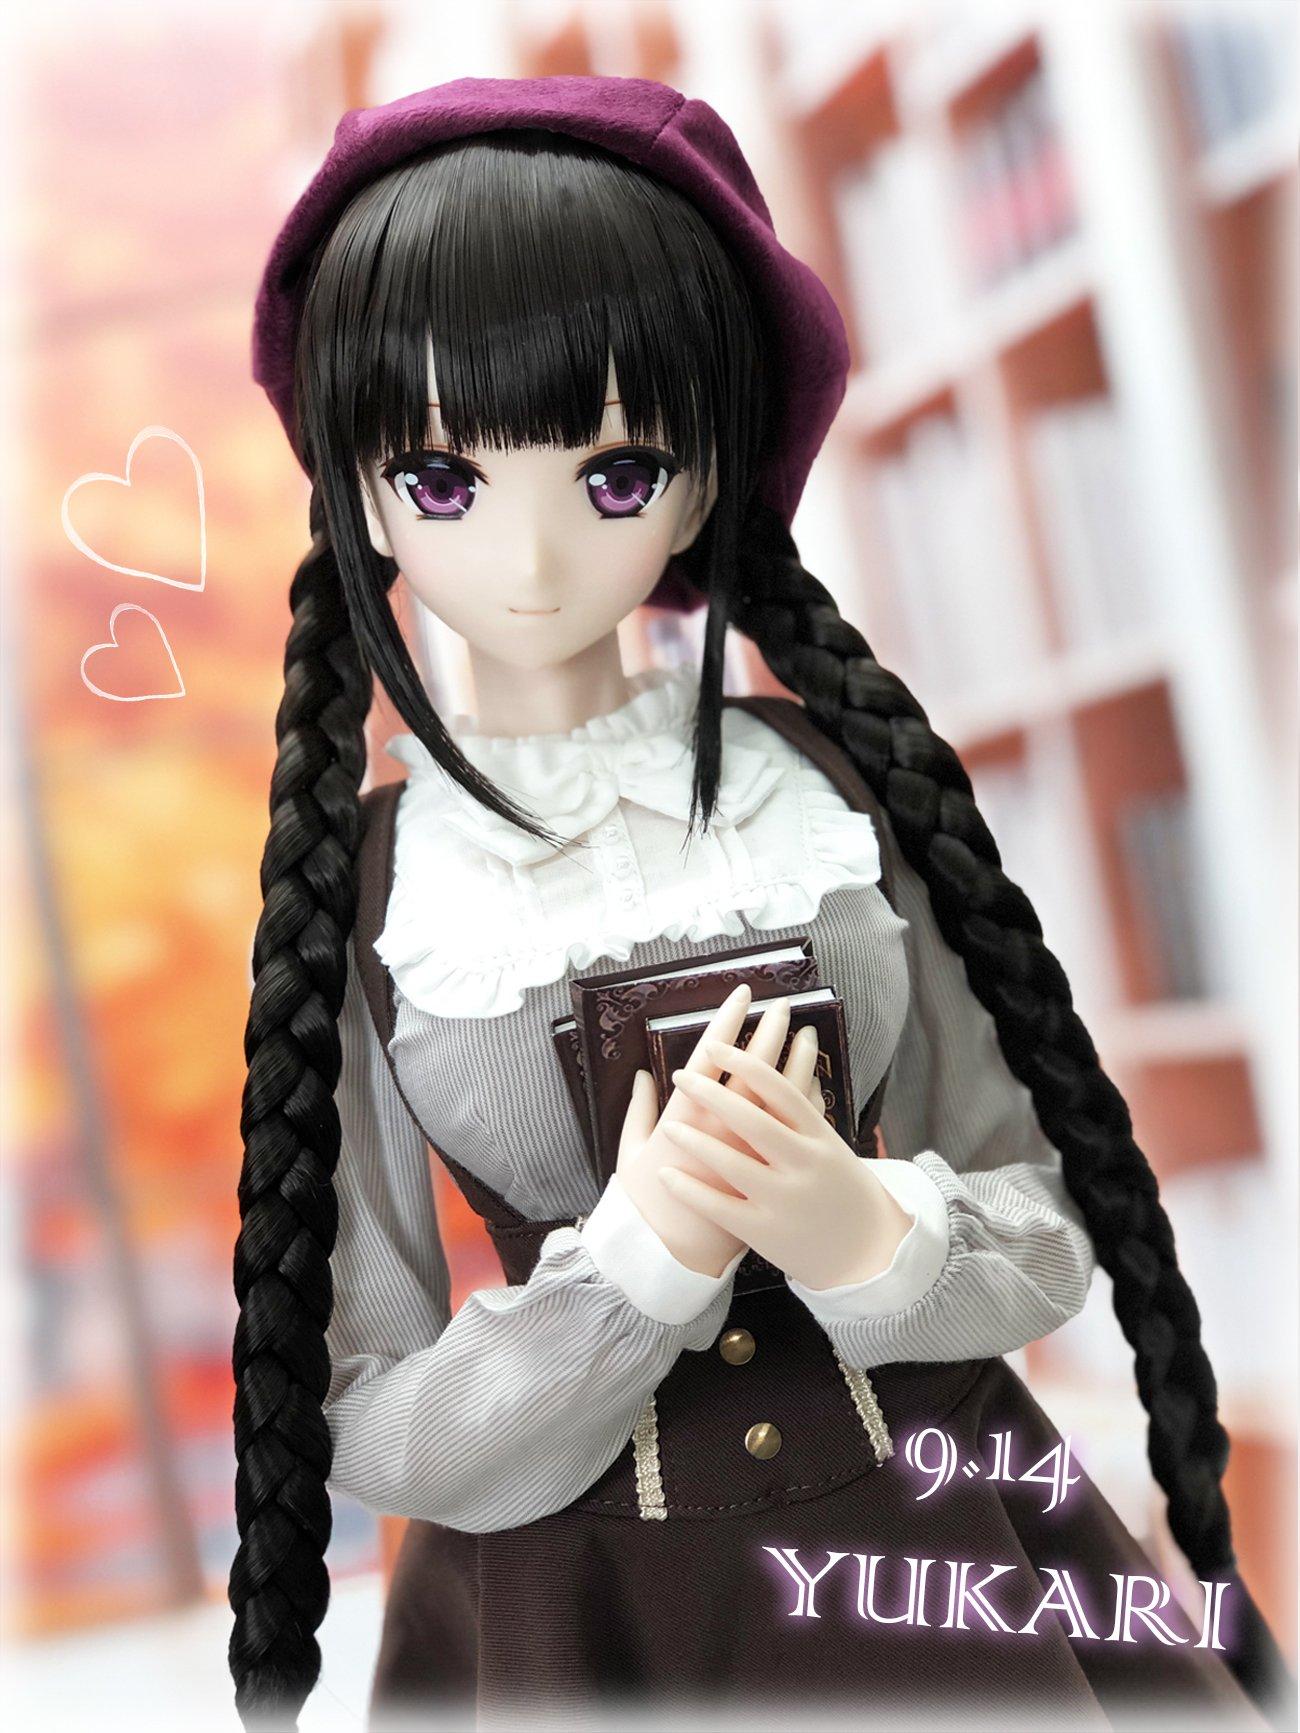 [Azone] 1/3 Happiness Clover - Yukari - Kazuharu Kina School Uniform Collection  Eevkqm10